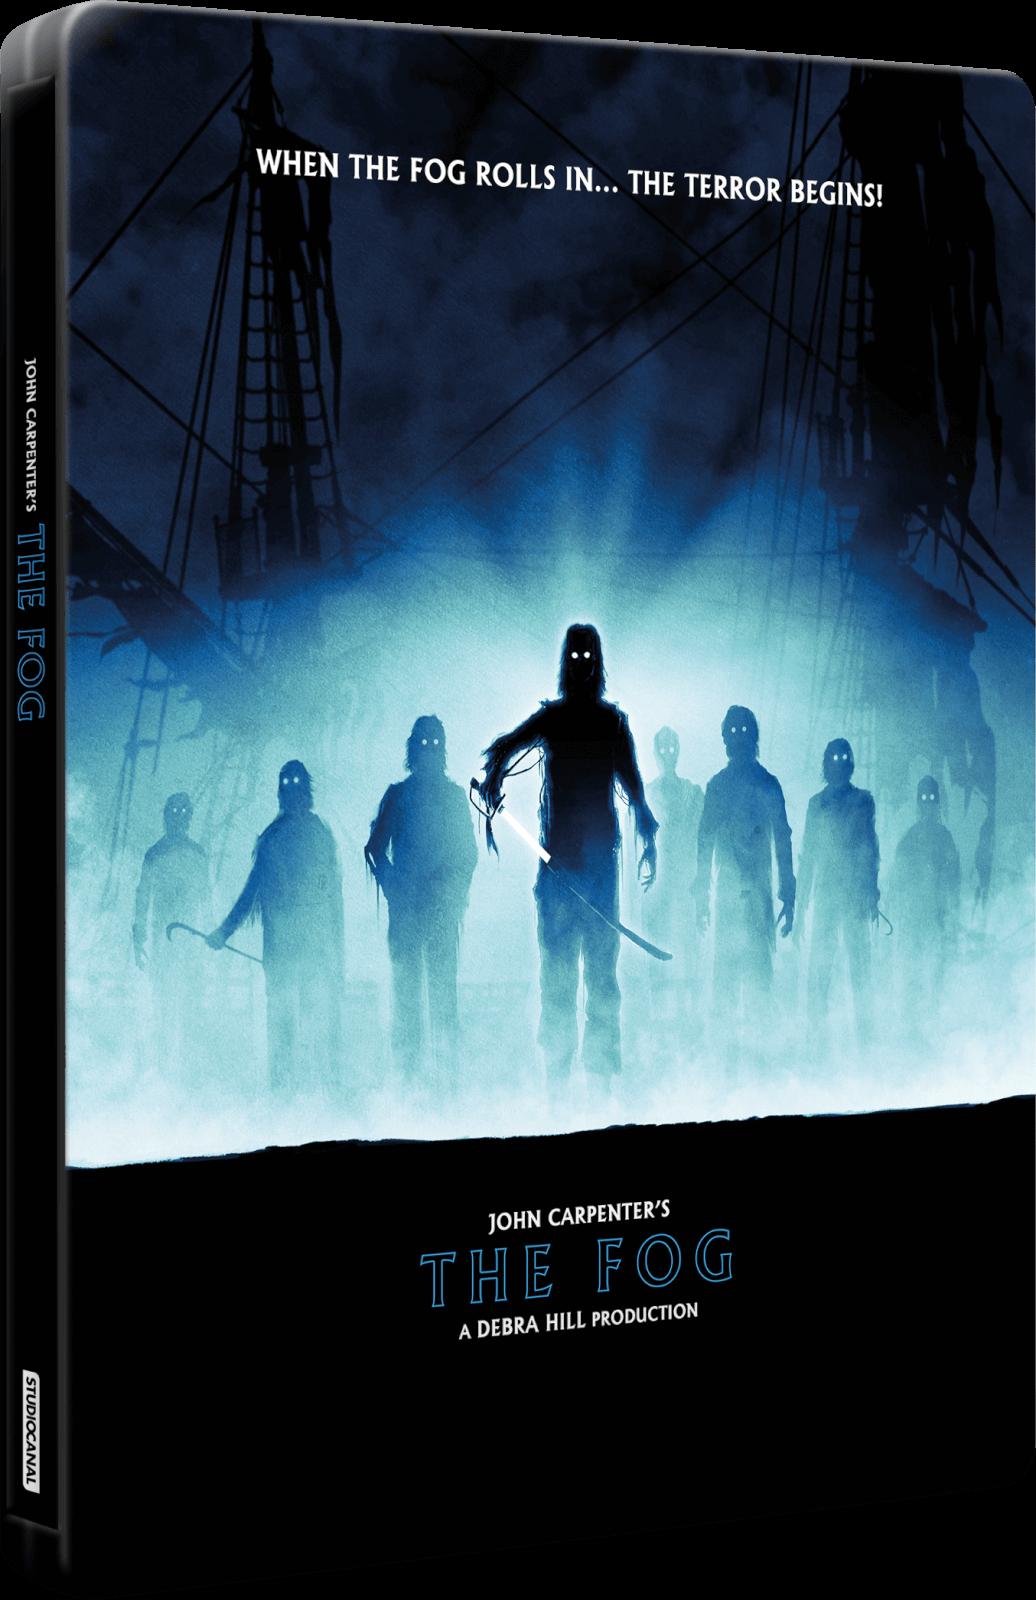 The Fog 4k Ultra Hd Amp Blu Ray Zavvi Exclusive Steelbook